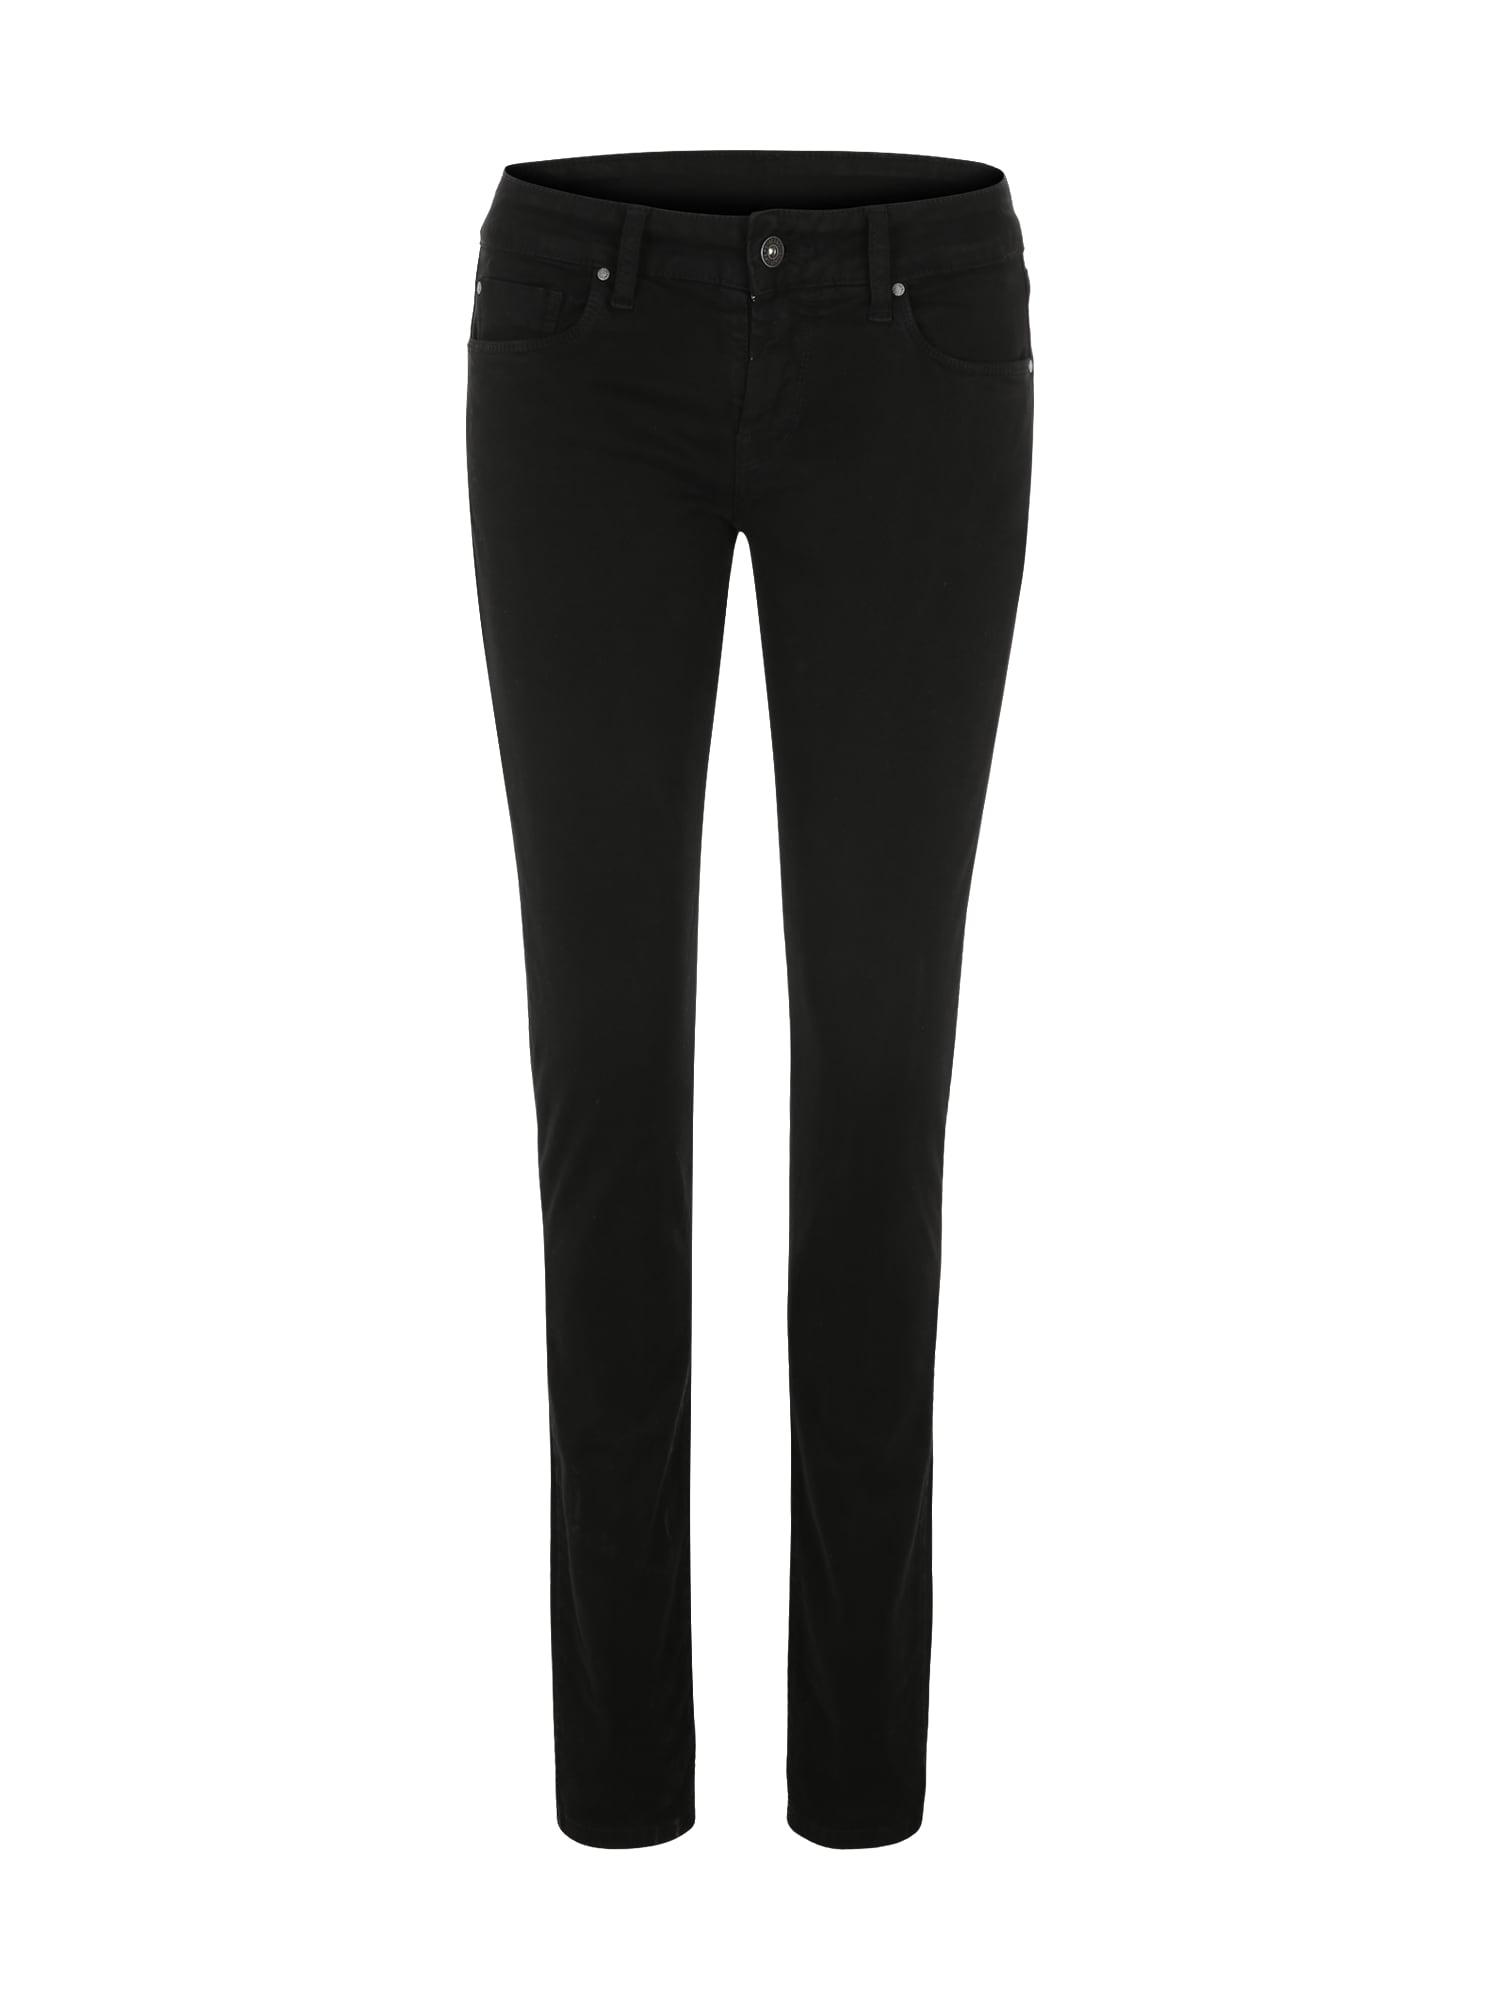 Pepe Jeans Dames Broek Soho zwart